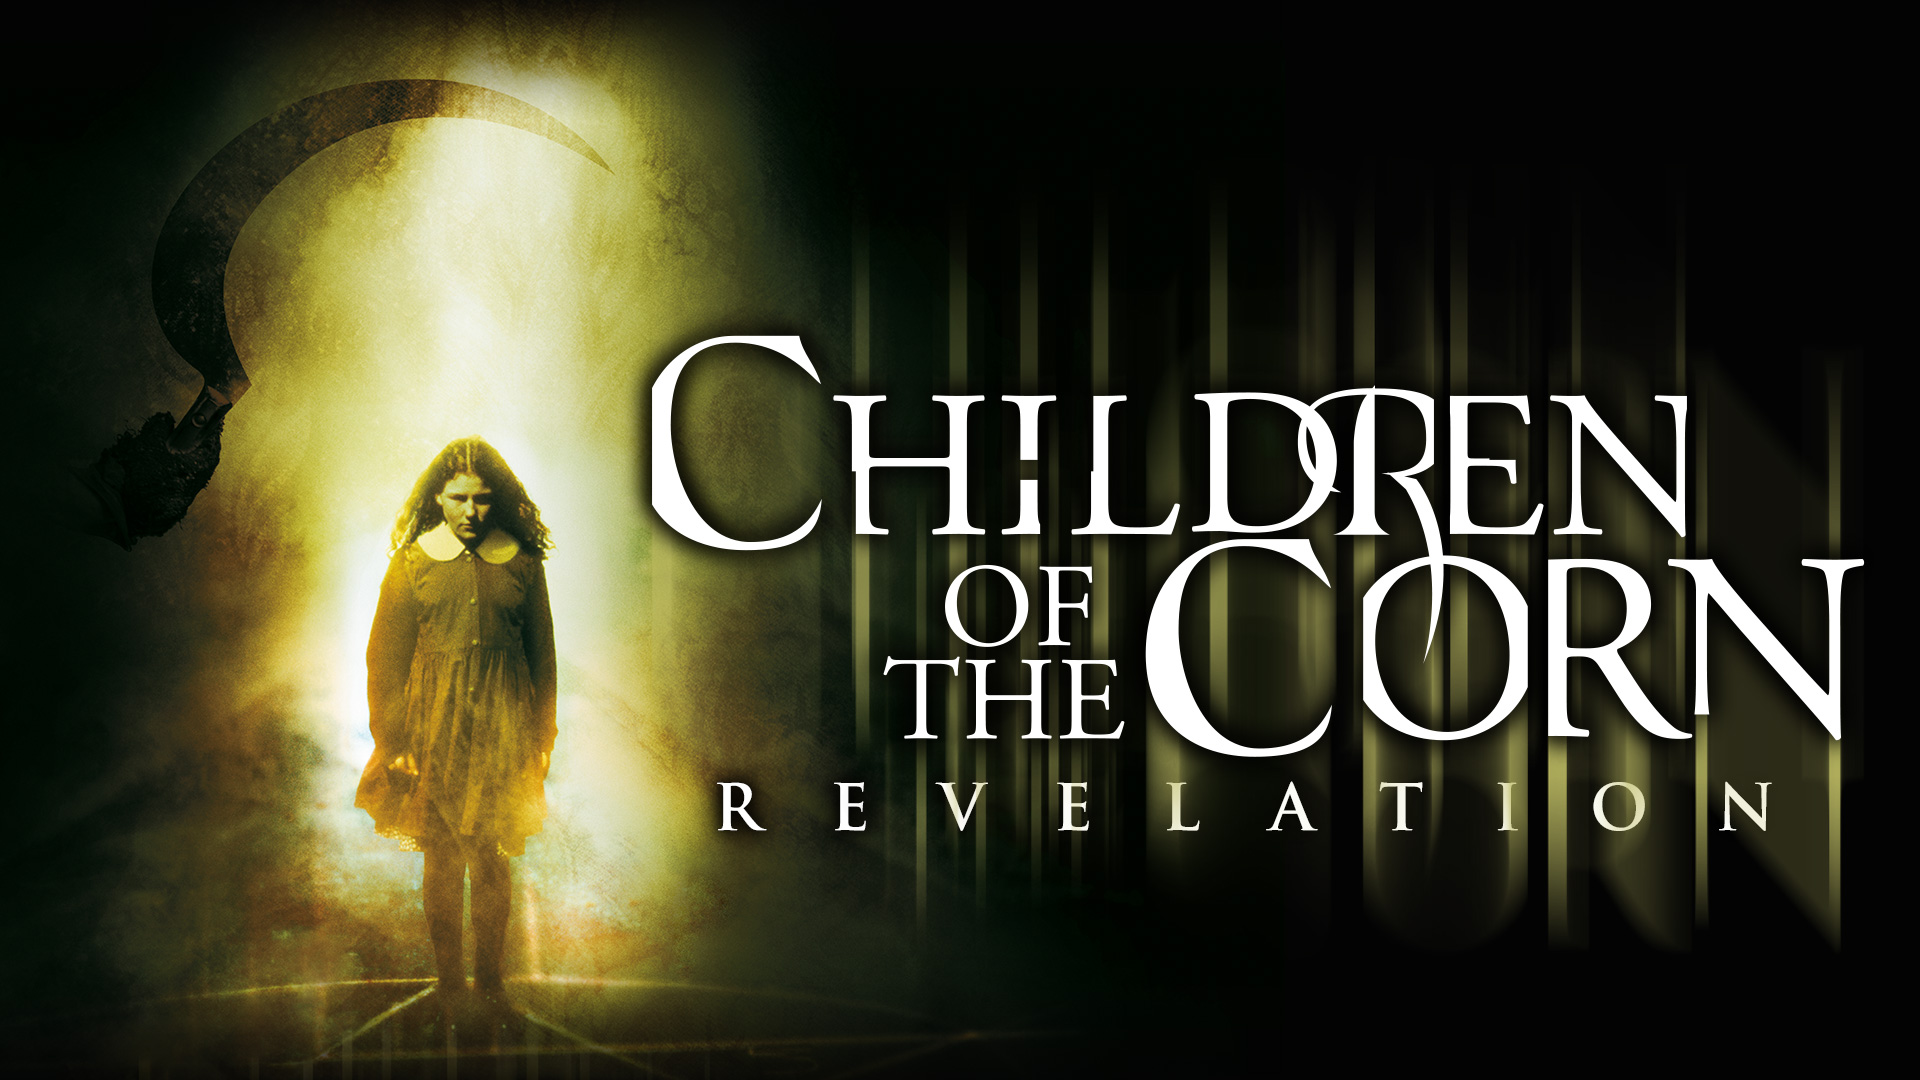 Children of the Corn VII: Revelation - Official Trailer (HD)